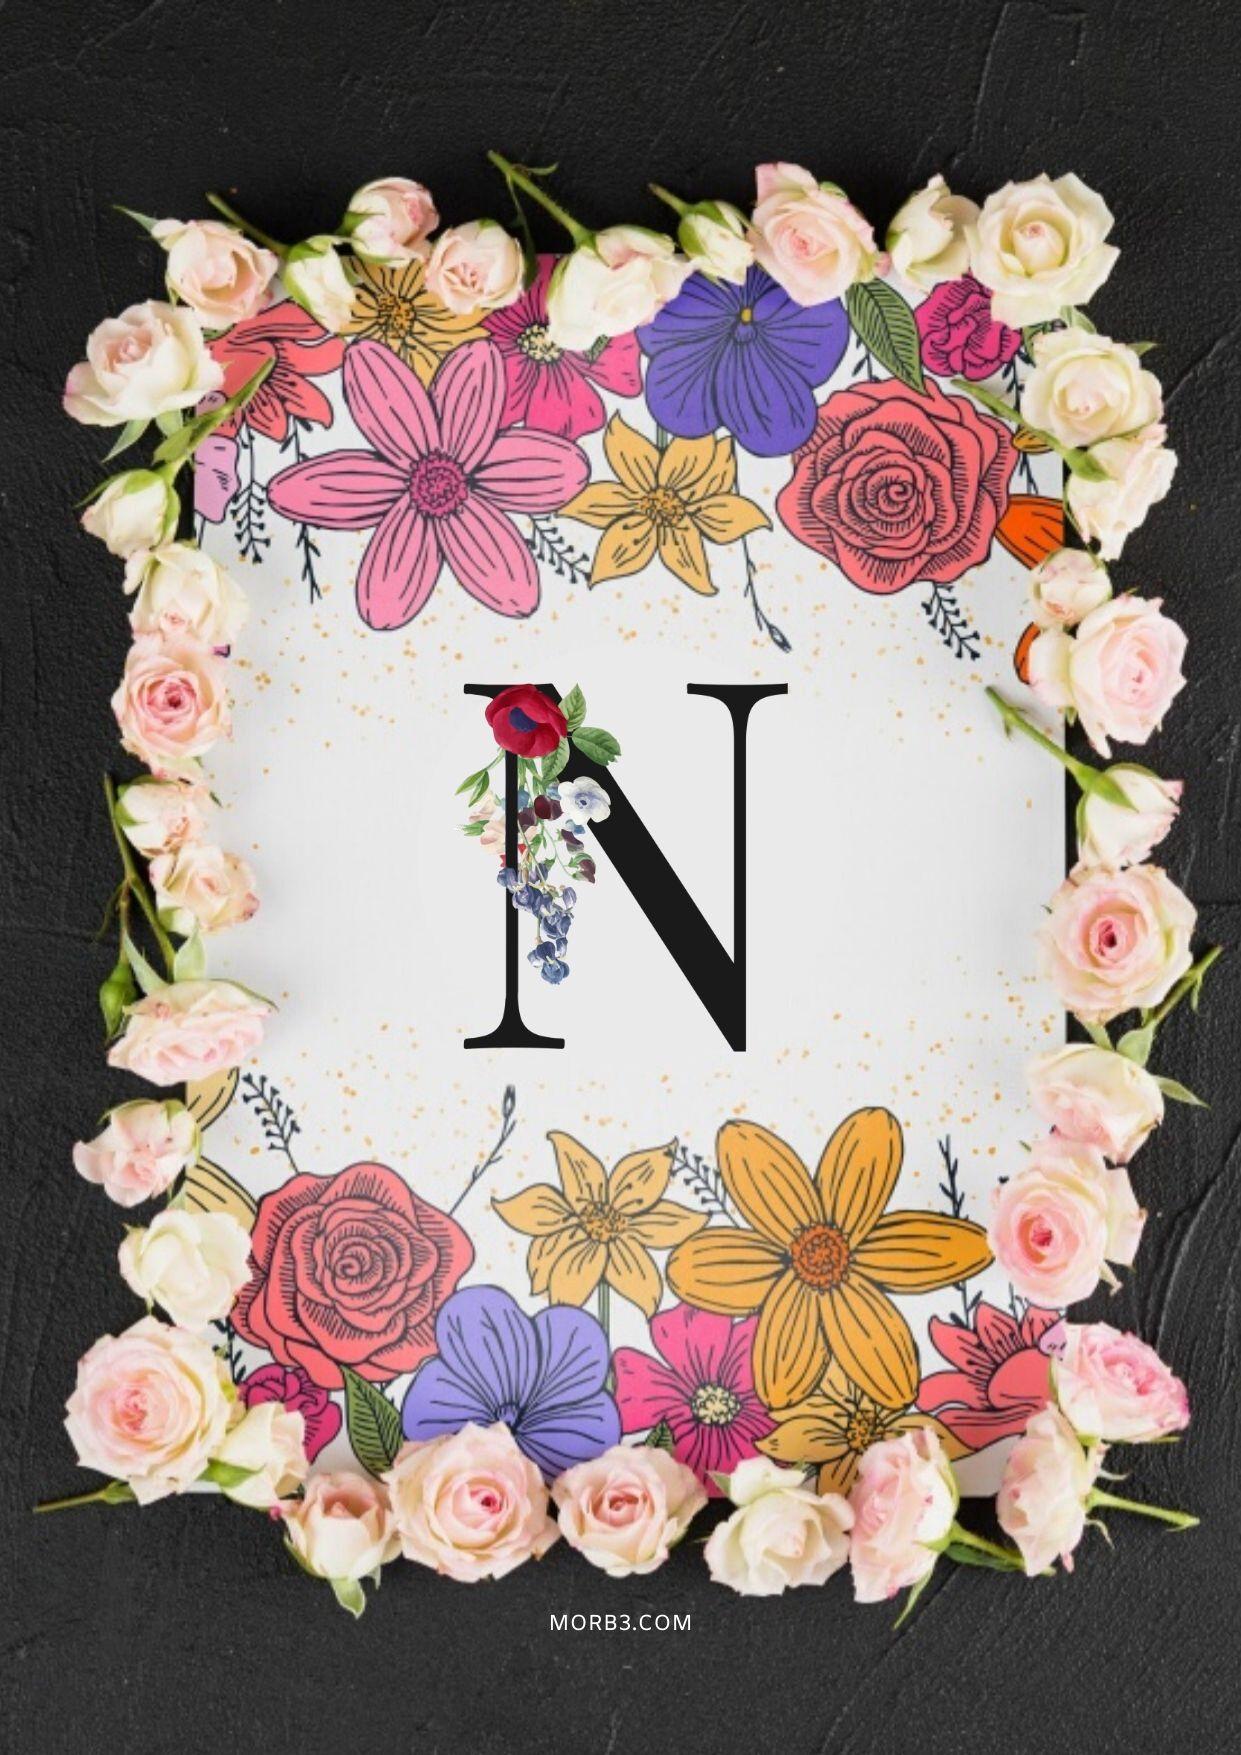 صور حرف N خلفيات حرف N خلفيات حرف N رومانسية اجمل حرف N في العالم حرف N بالورد حرف N احبك حرف N في قلوب حرف N مع كلام حب خلفيات حرف